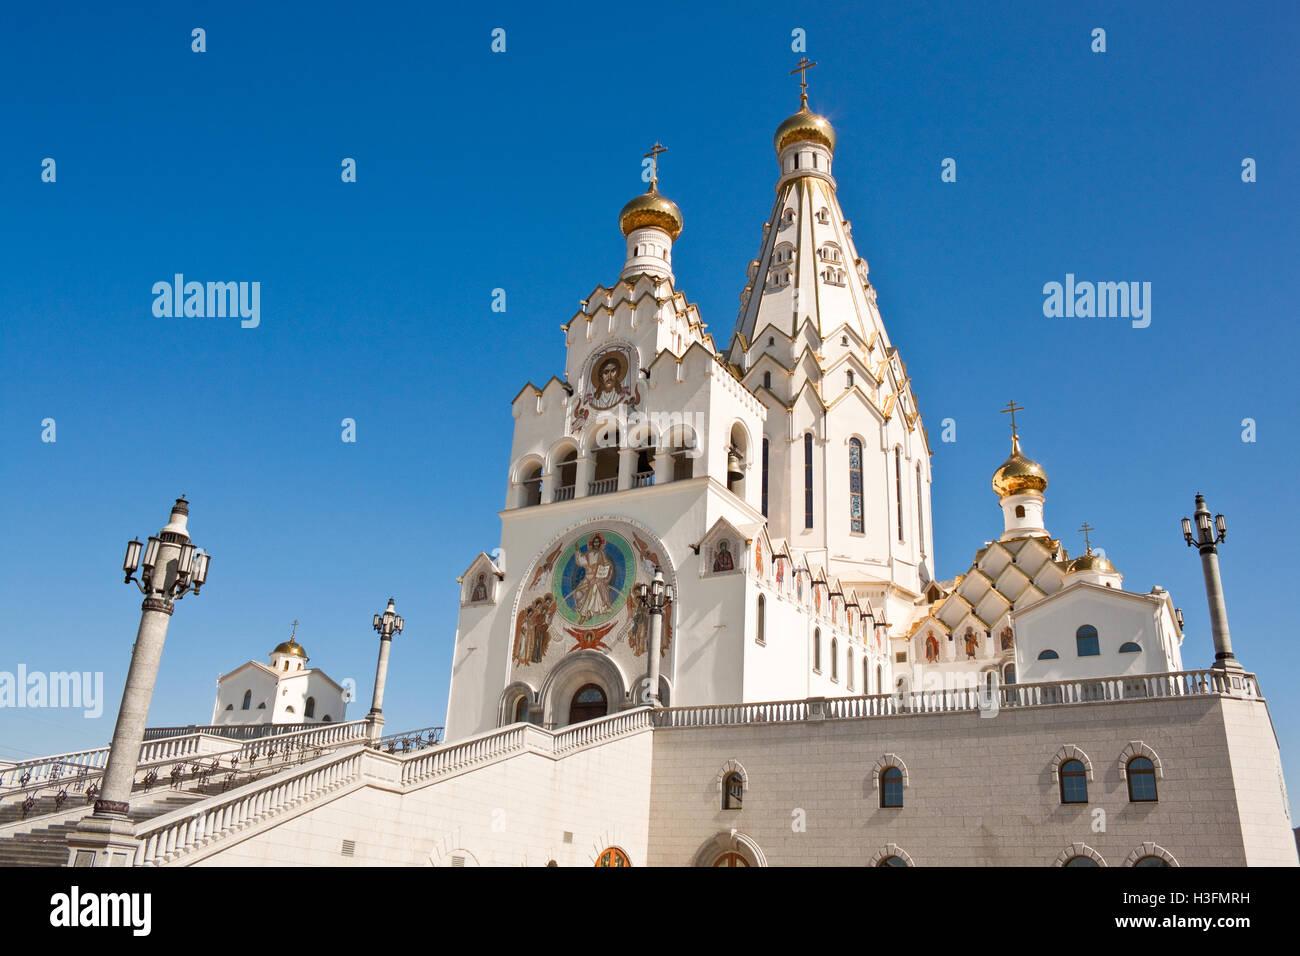 All saints orthodox  church in MInsk, Belarus Stock Photo